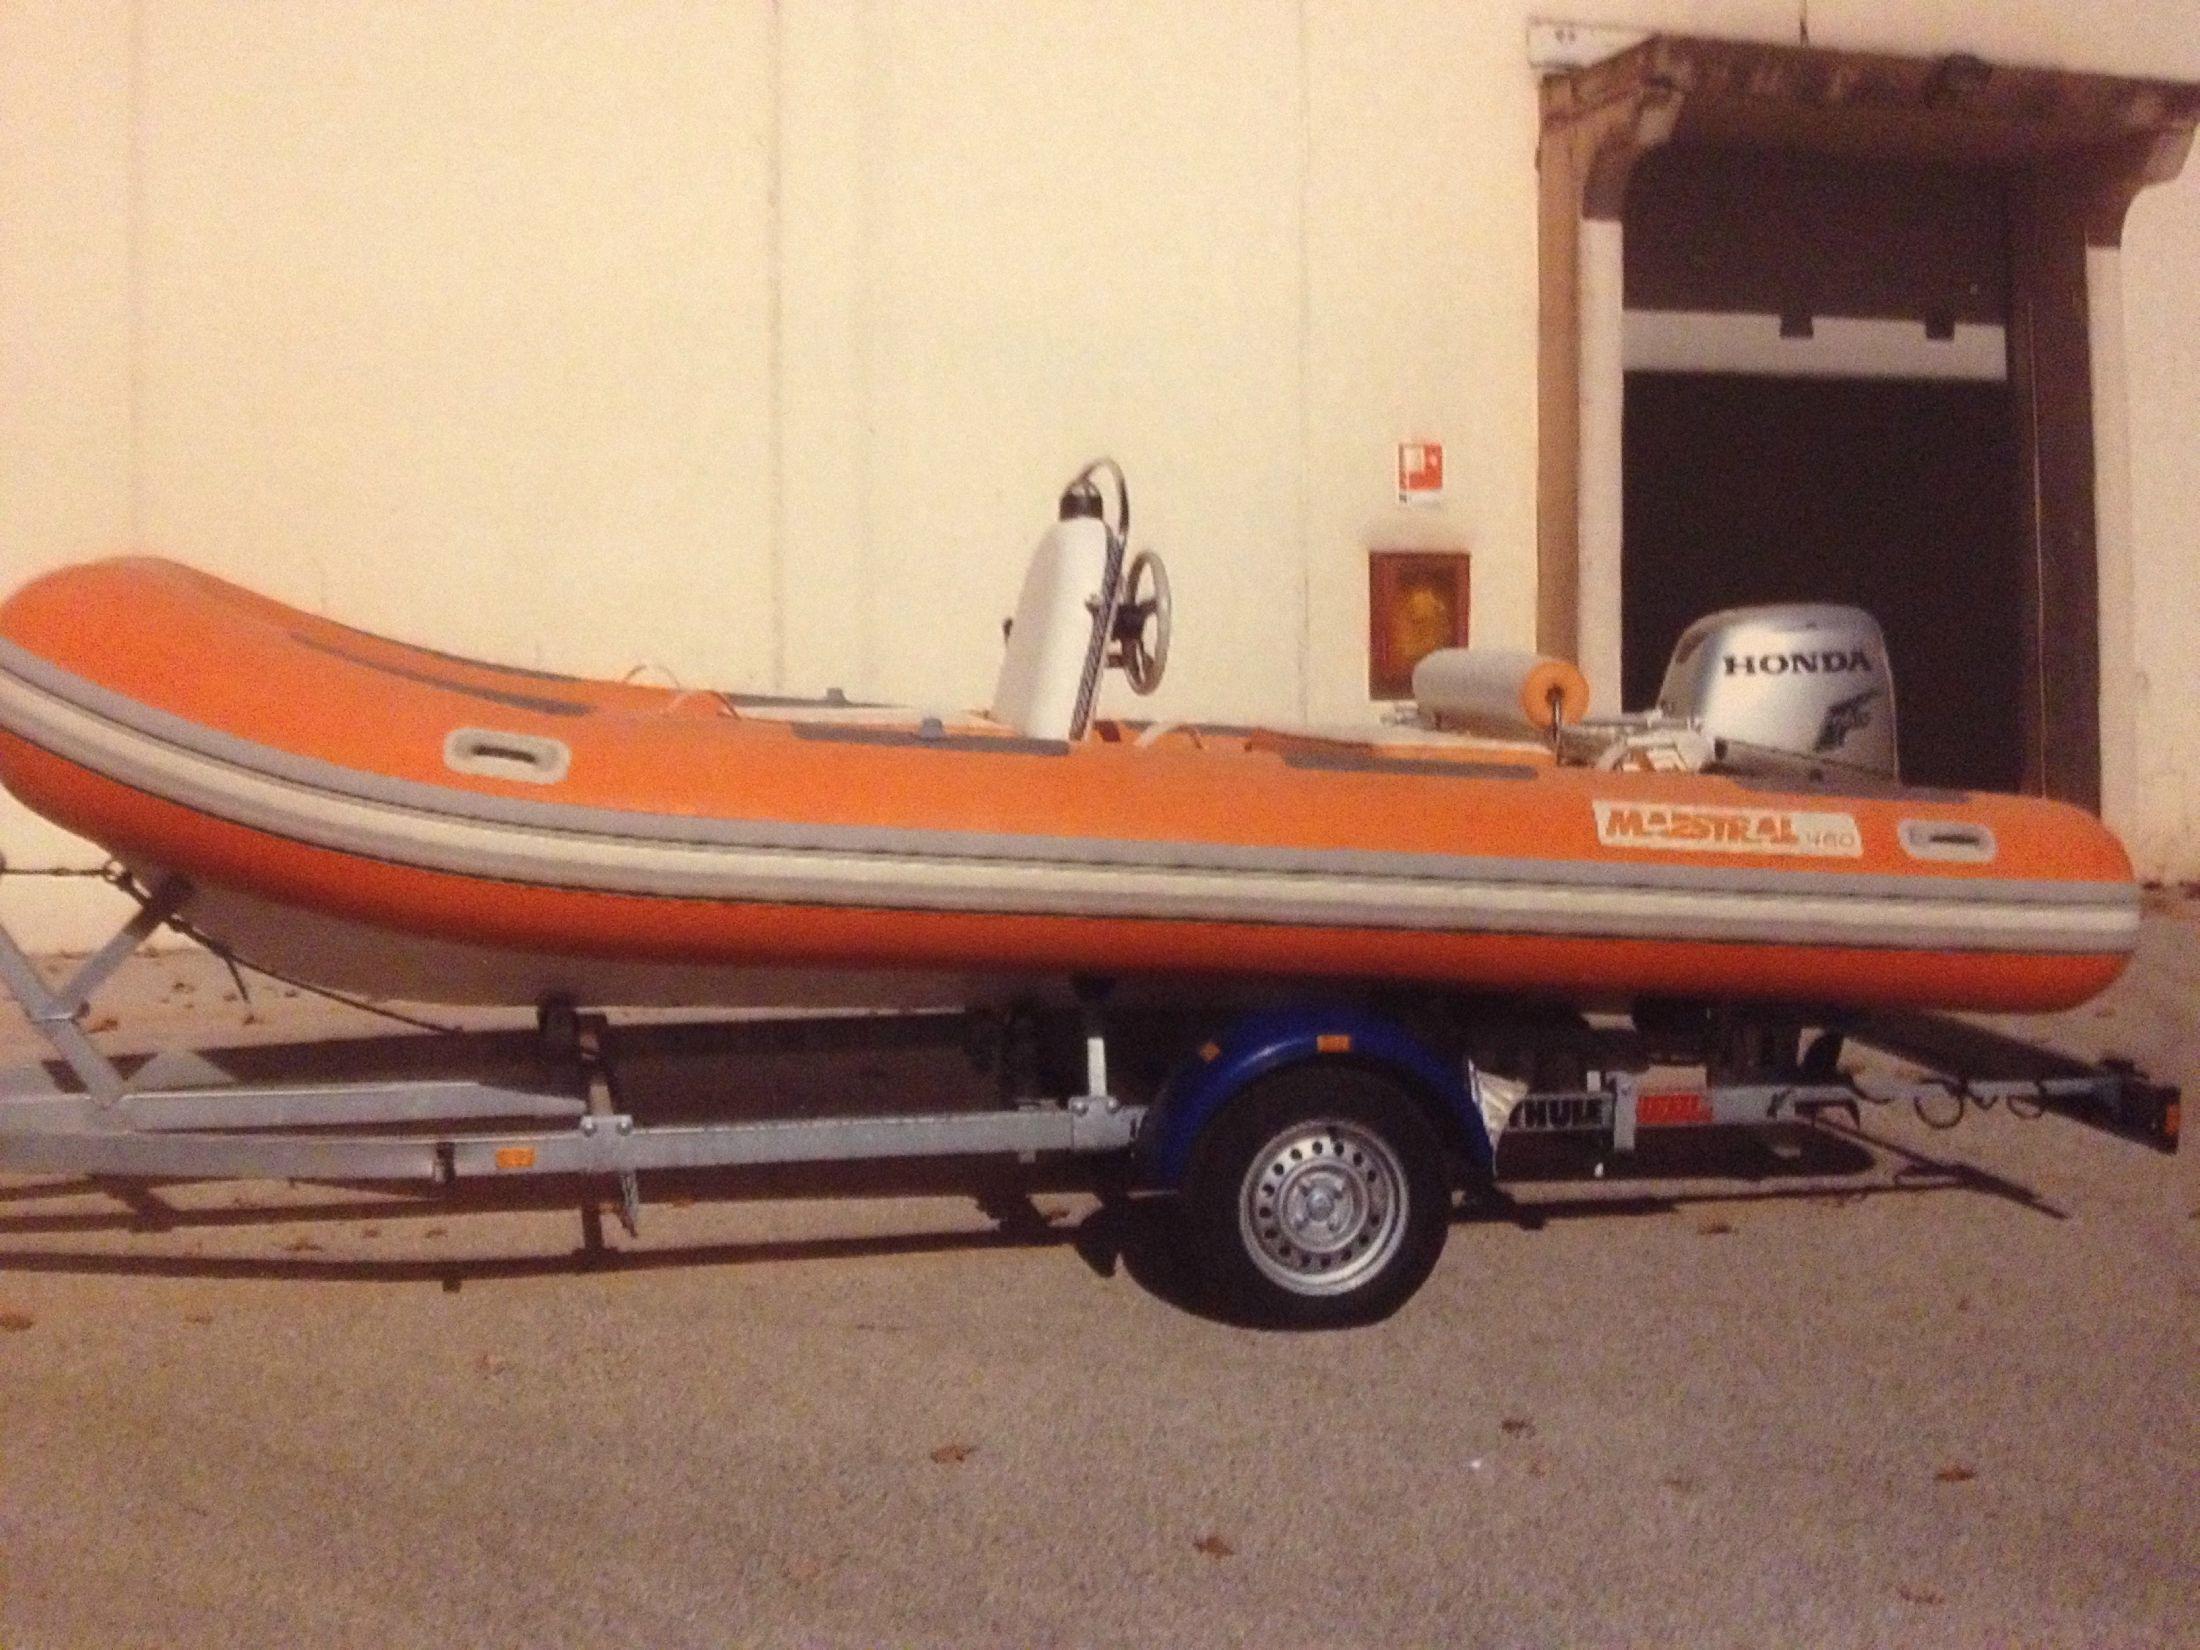 2011 Mistral 460 Power Boat For Sale